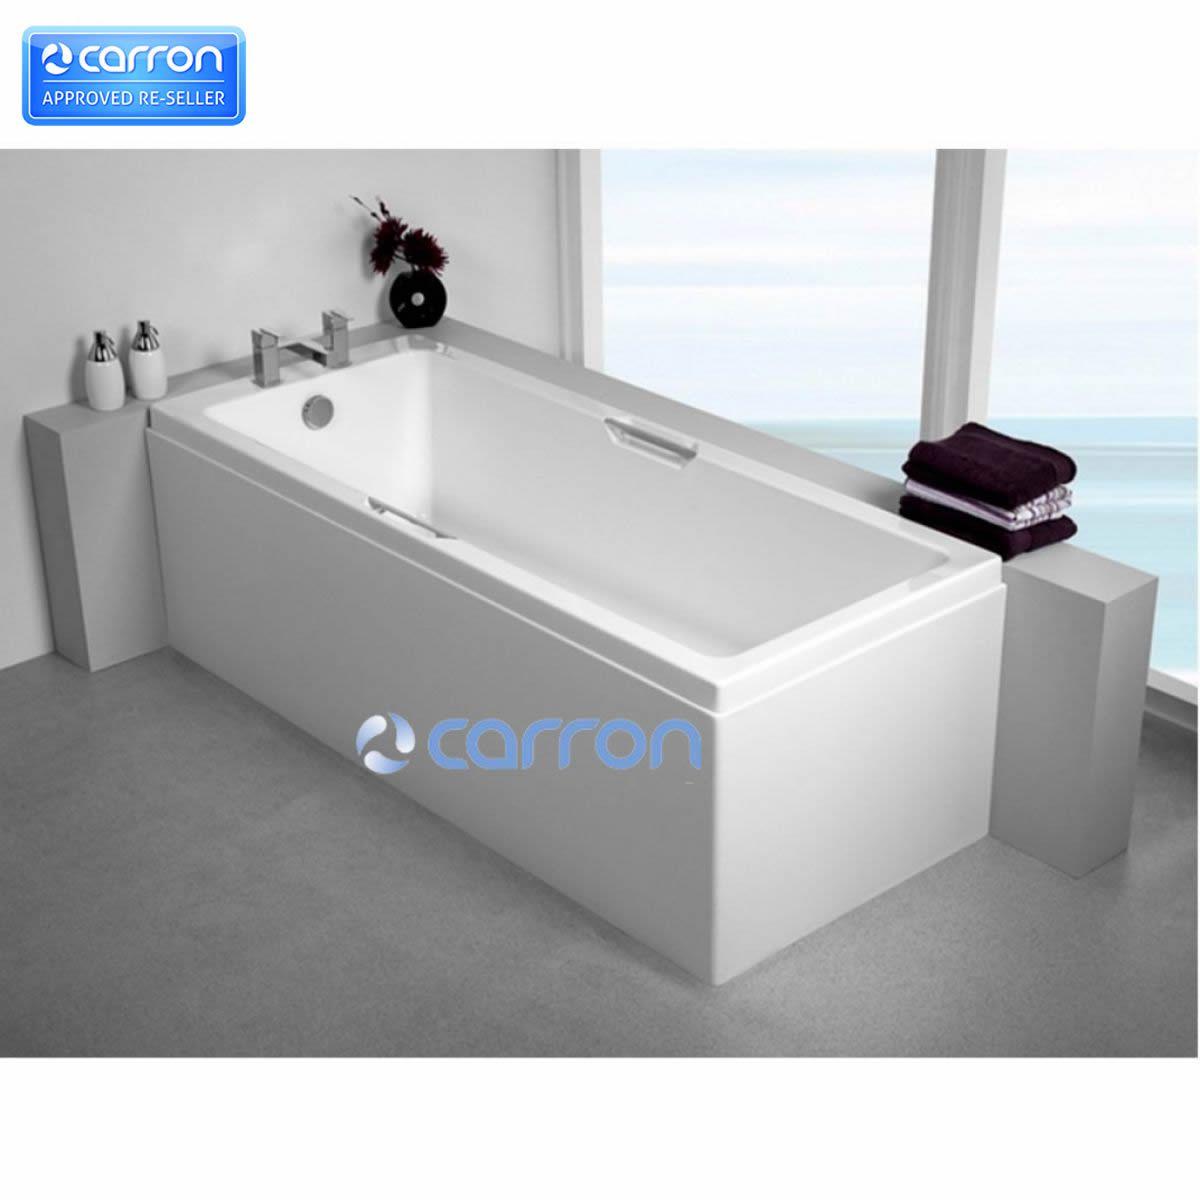 Carron Quantum Integra Bath With Twin Grips Uk Bathrooms